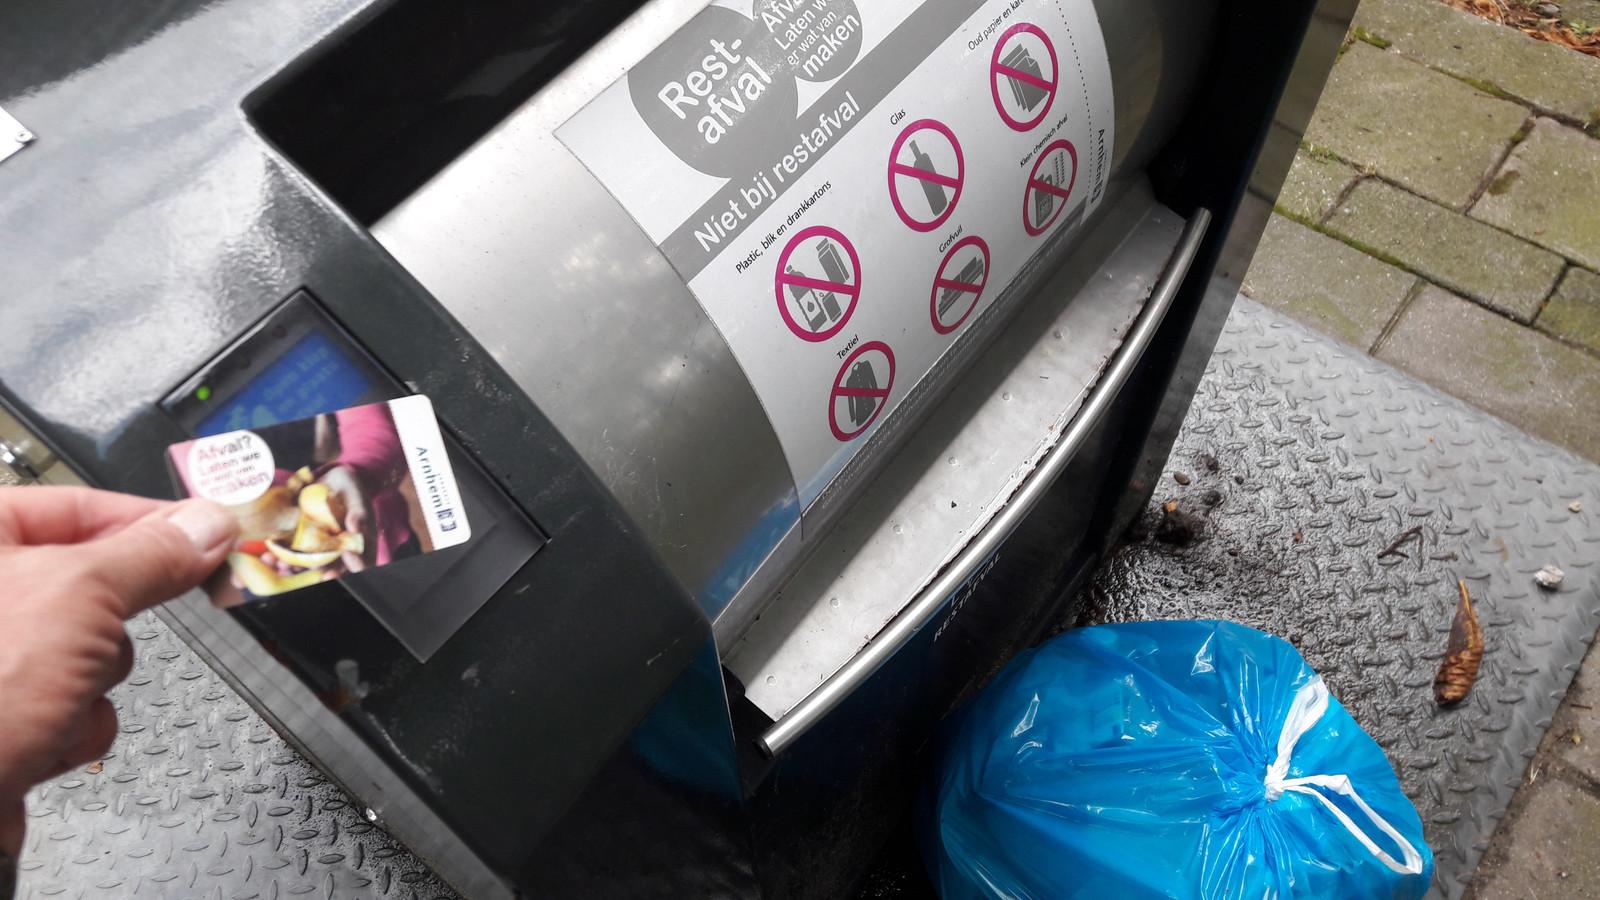 Afval weggooien in Arnhem kan voorlopig zonder gebruik van de afvalpas.